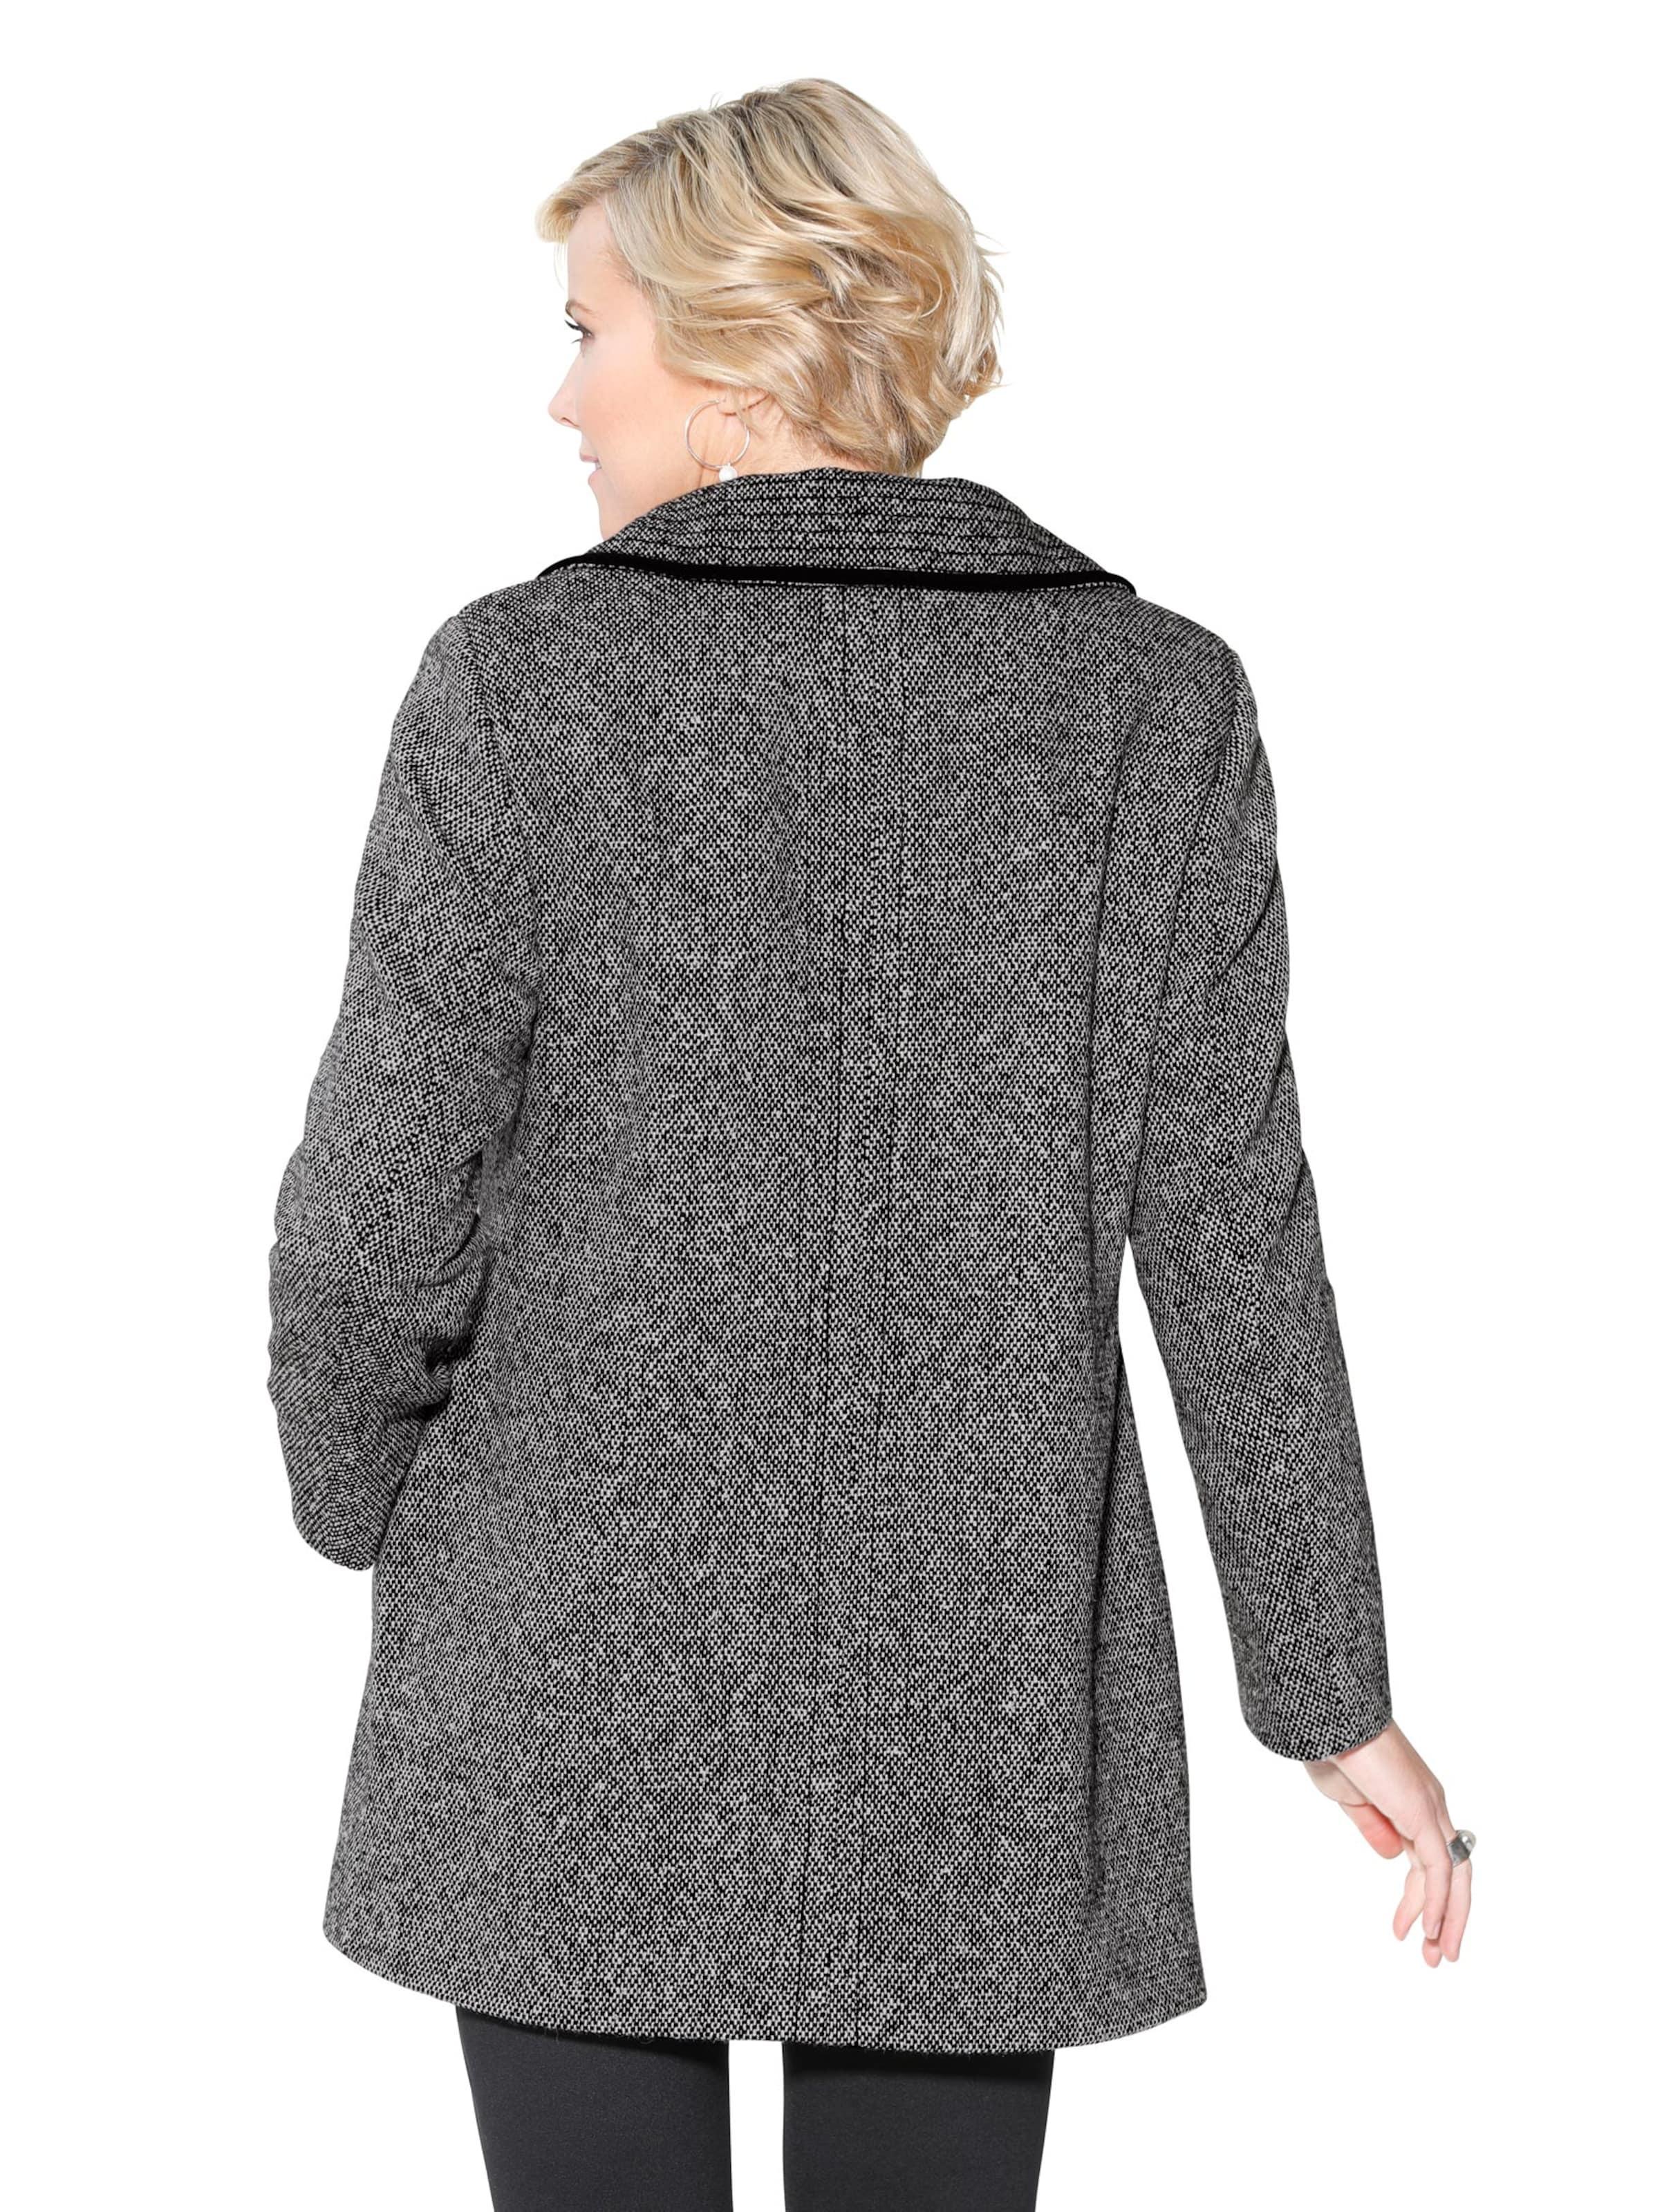 witt weiden -  Damen Jacke schwarz-weiß-meliert